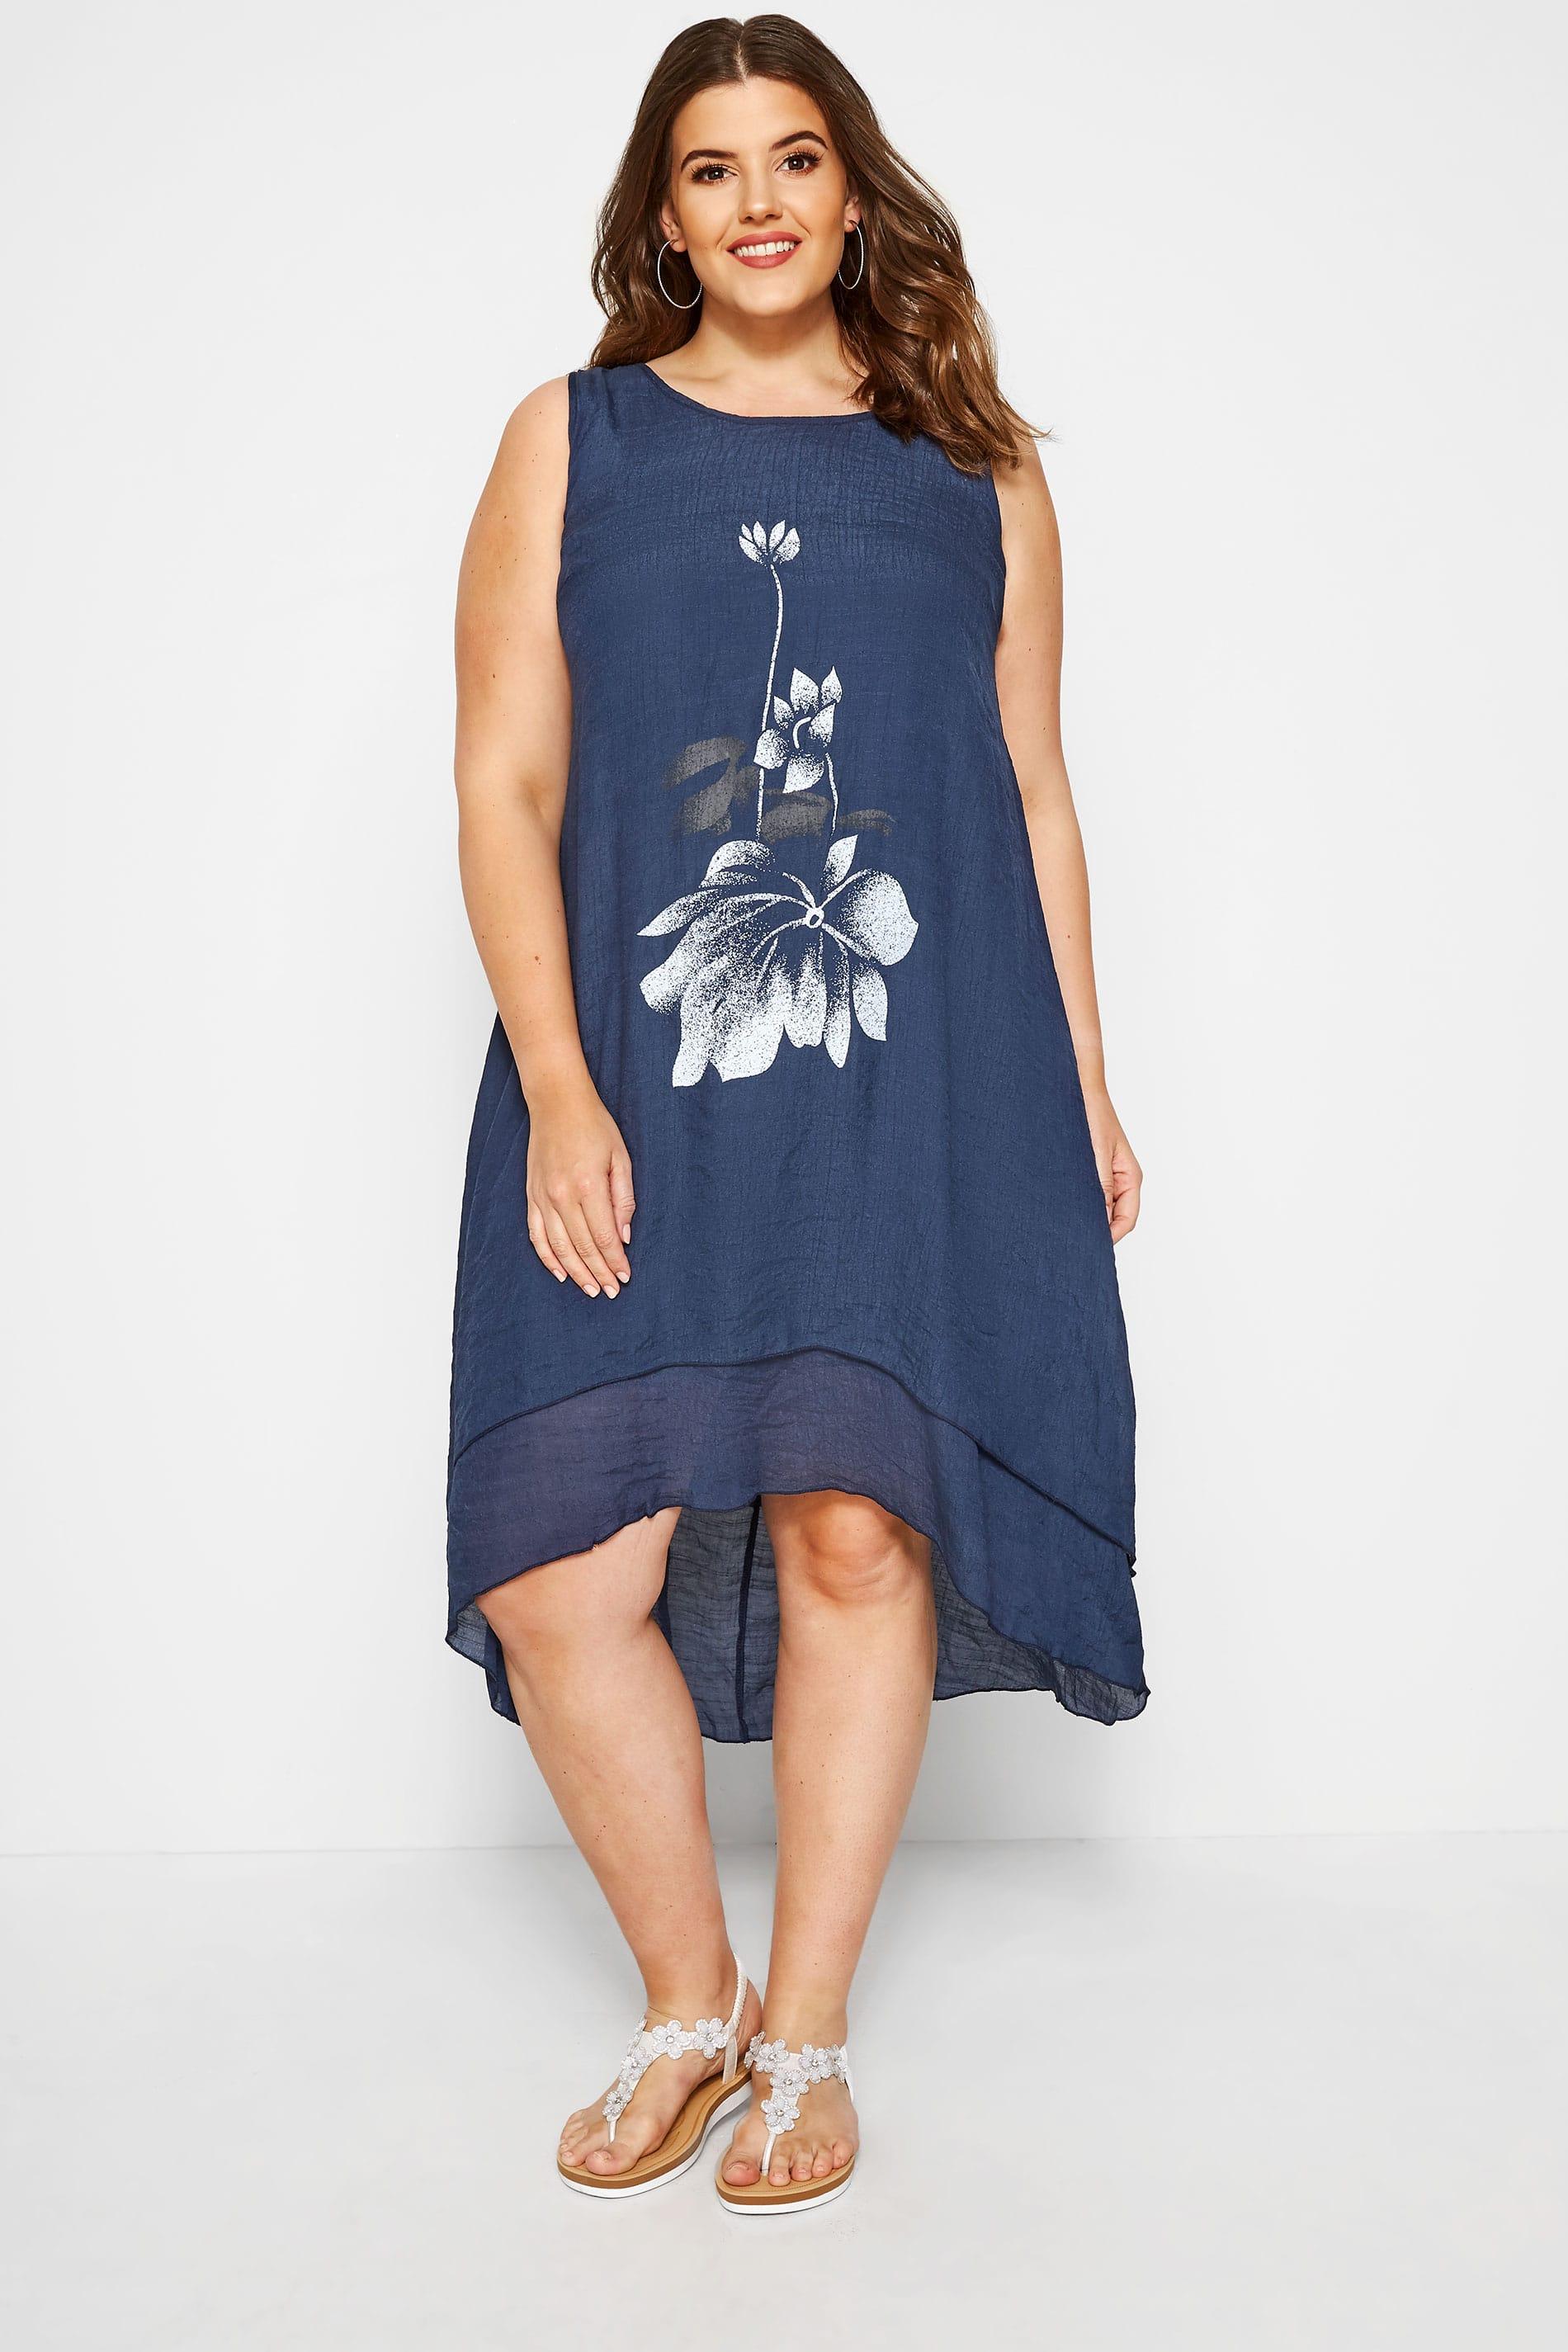 Navy Floral Dipped Hem Dress